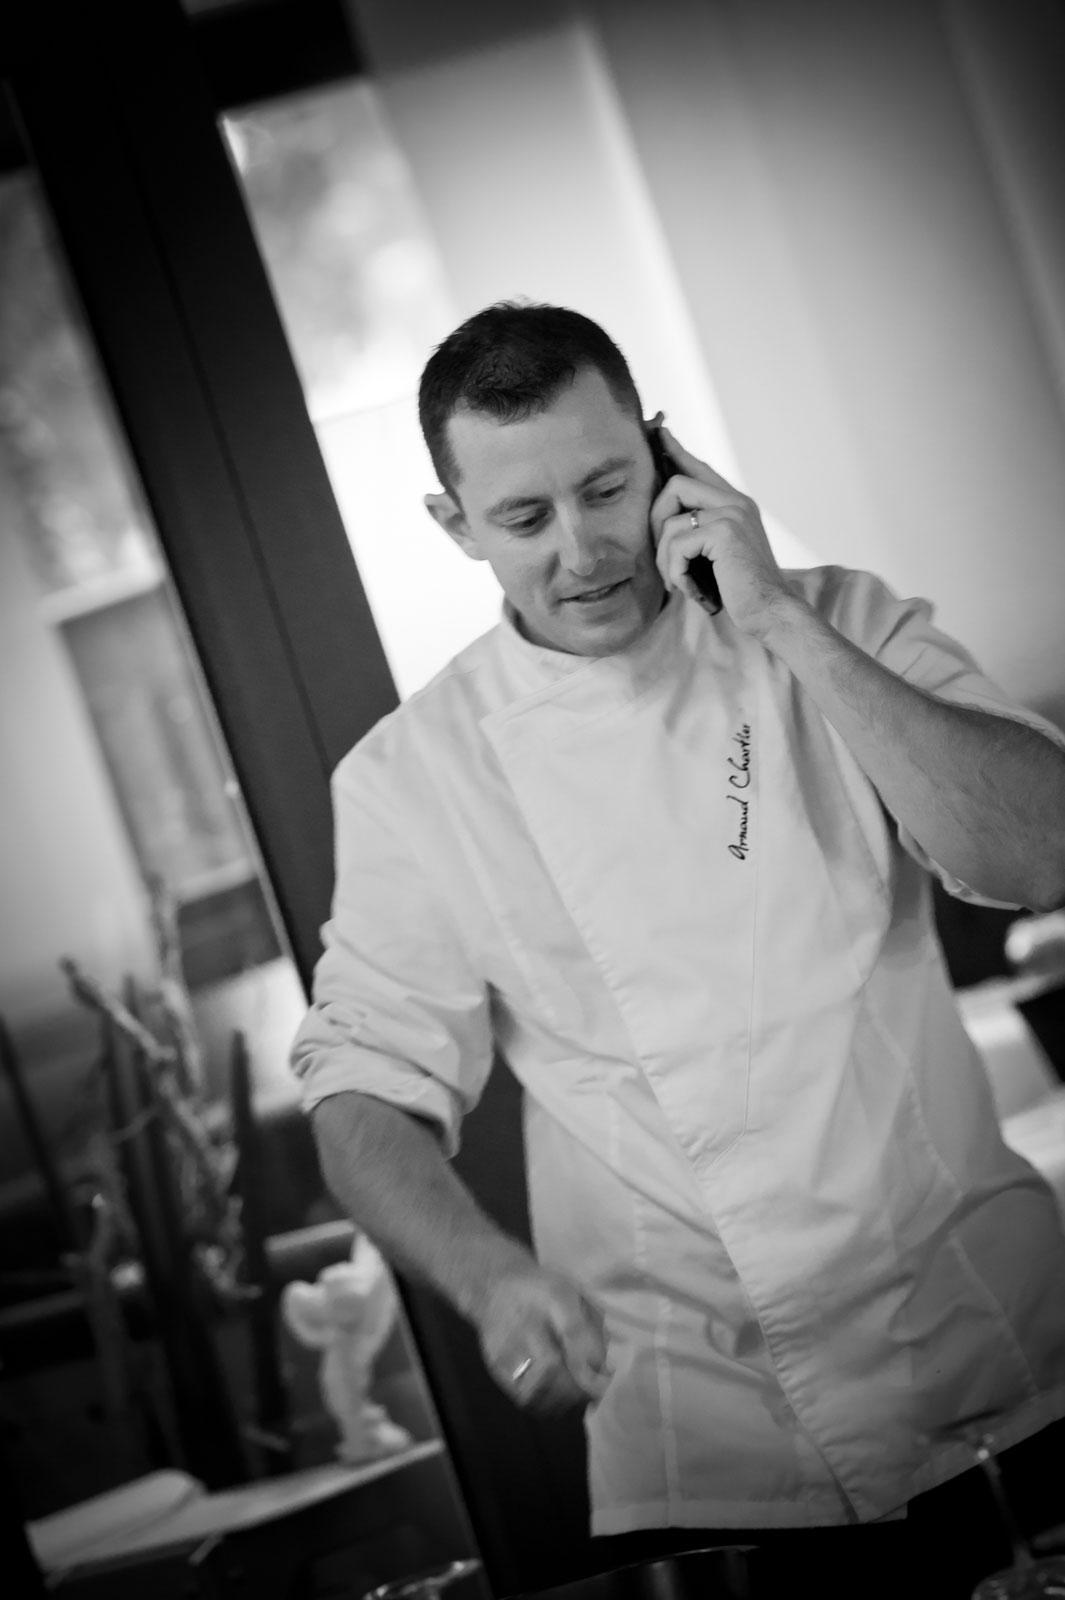 Le chef cuisinier Arnaud CHARTIER au restaurant LE PITEY